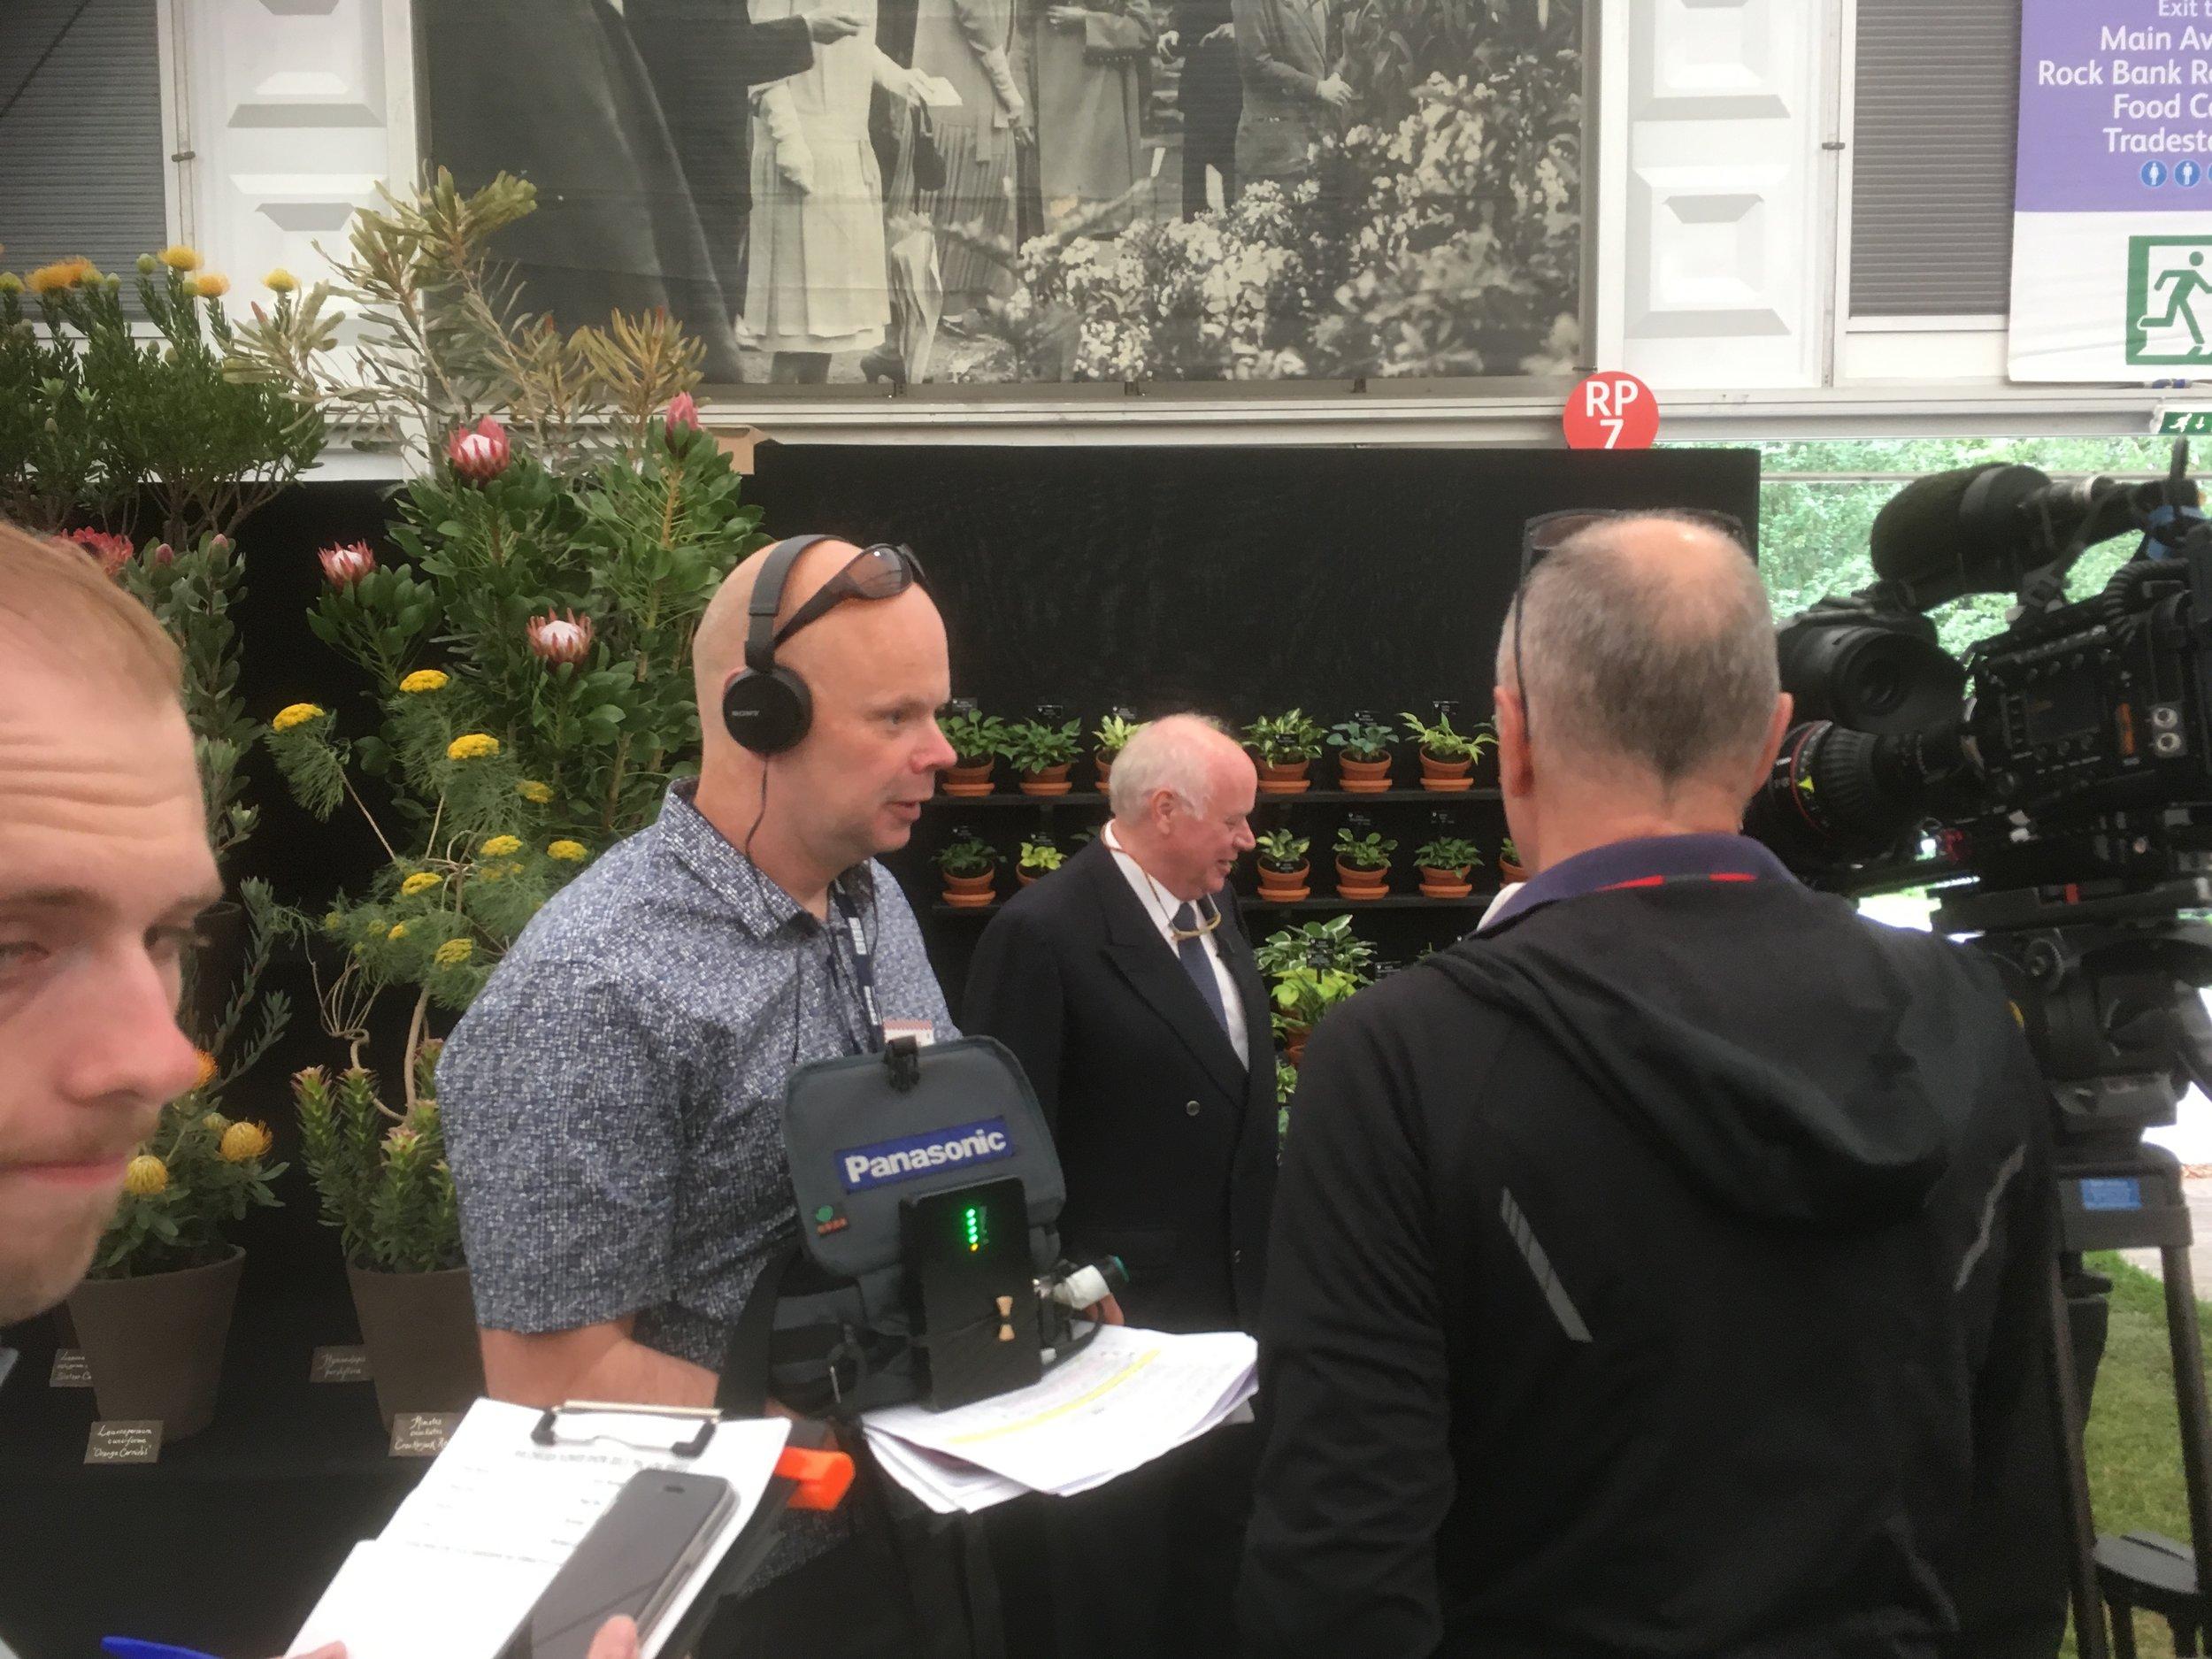 Jonathan and the BBC Film Crew